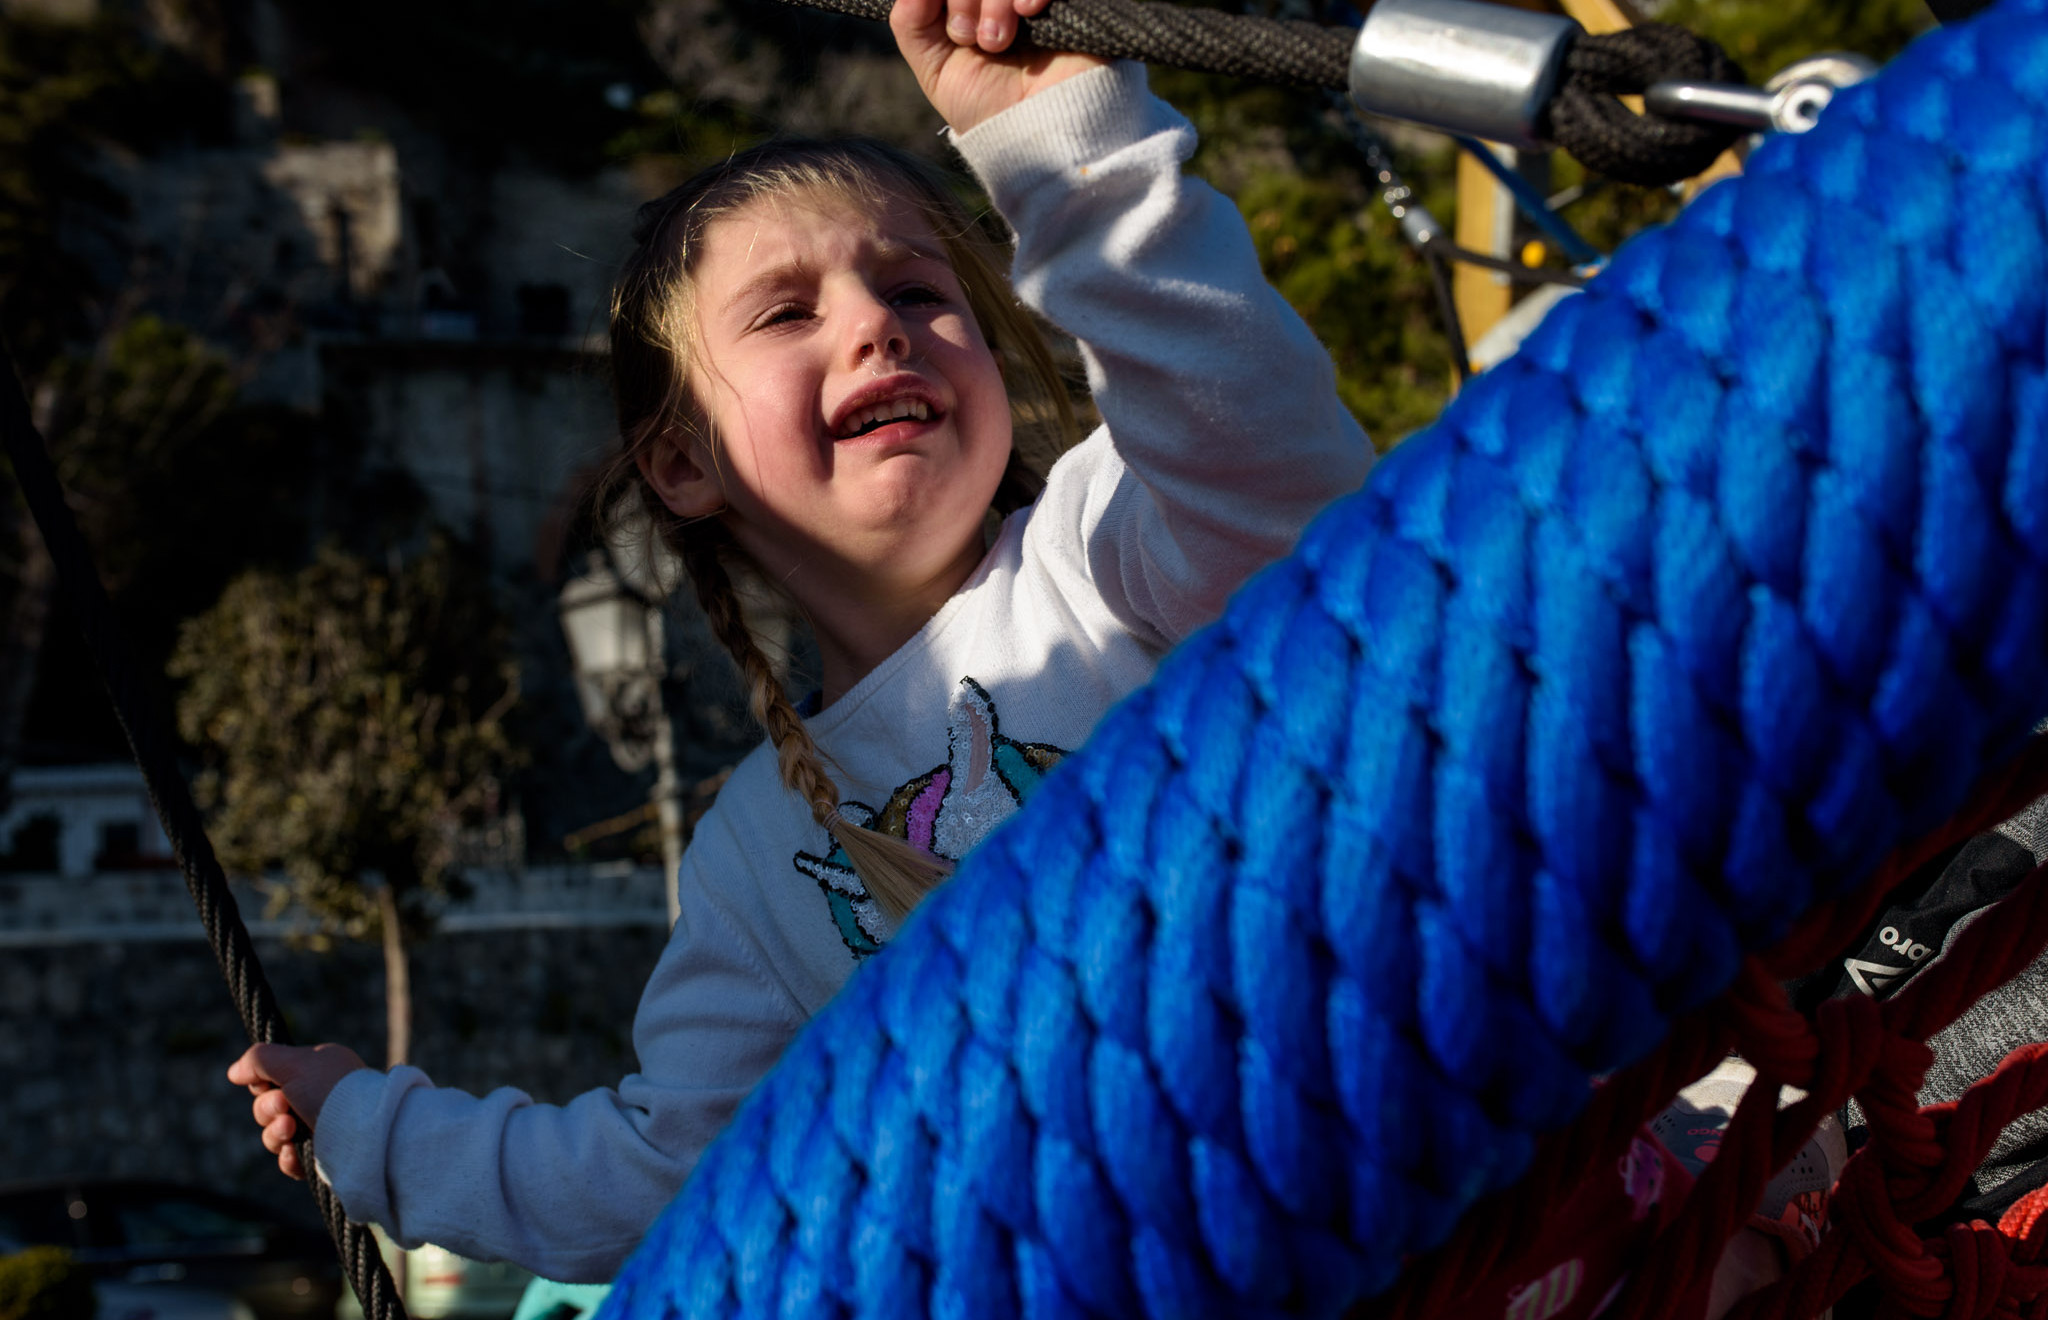 sad girl on a swing